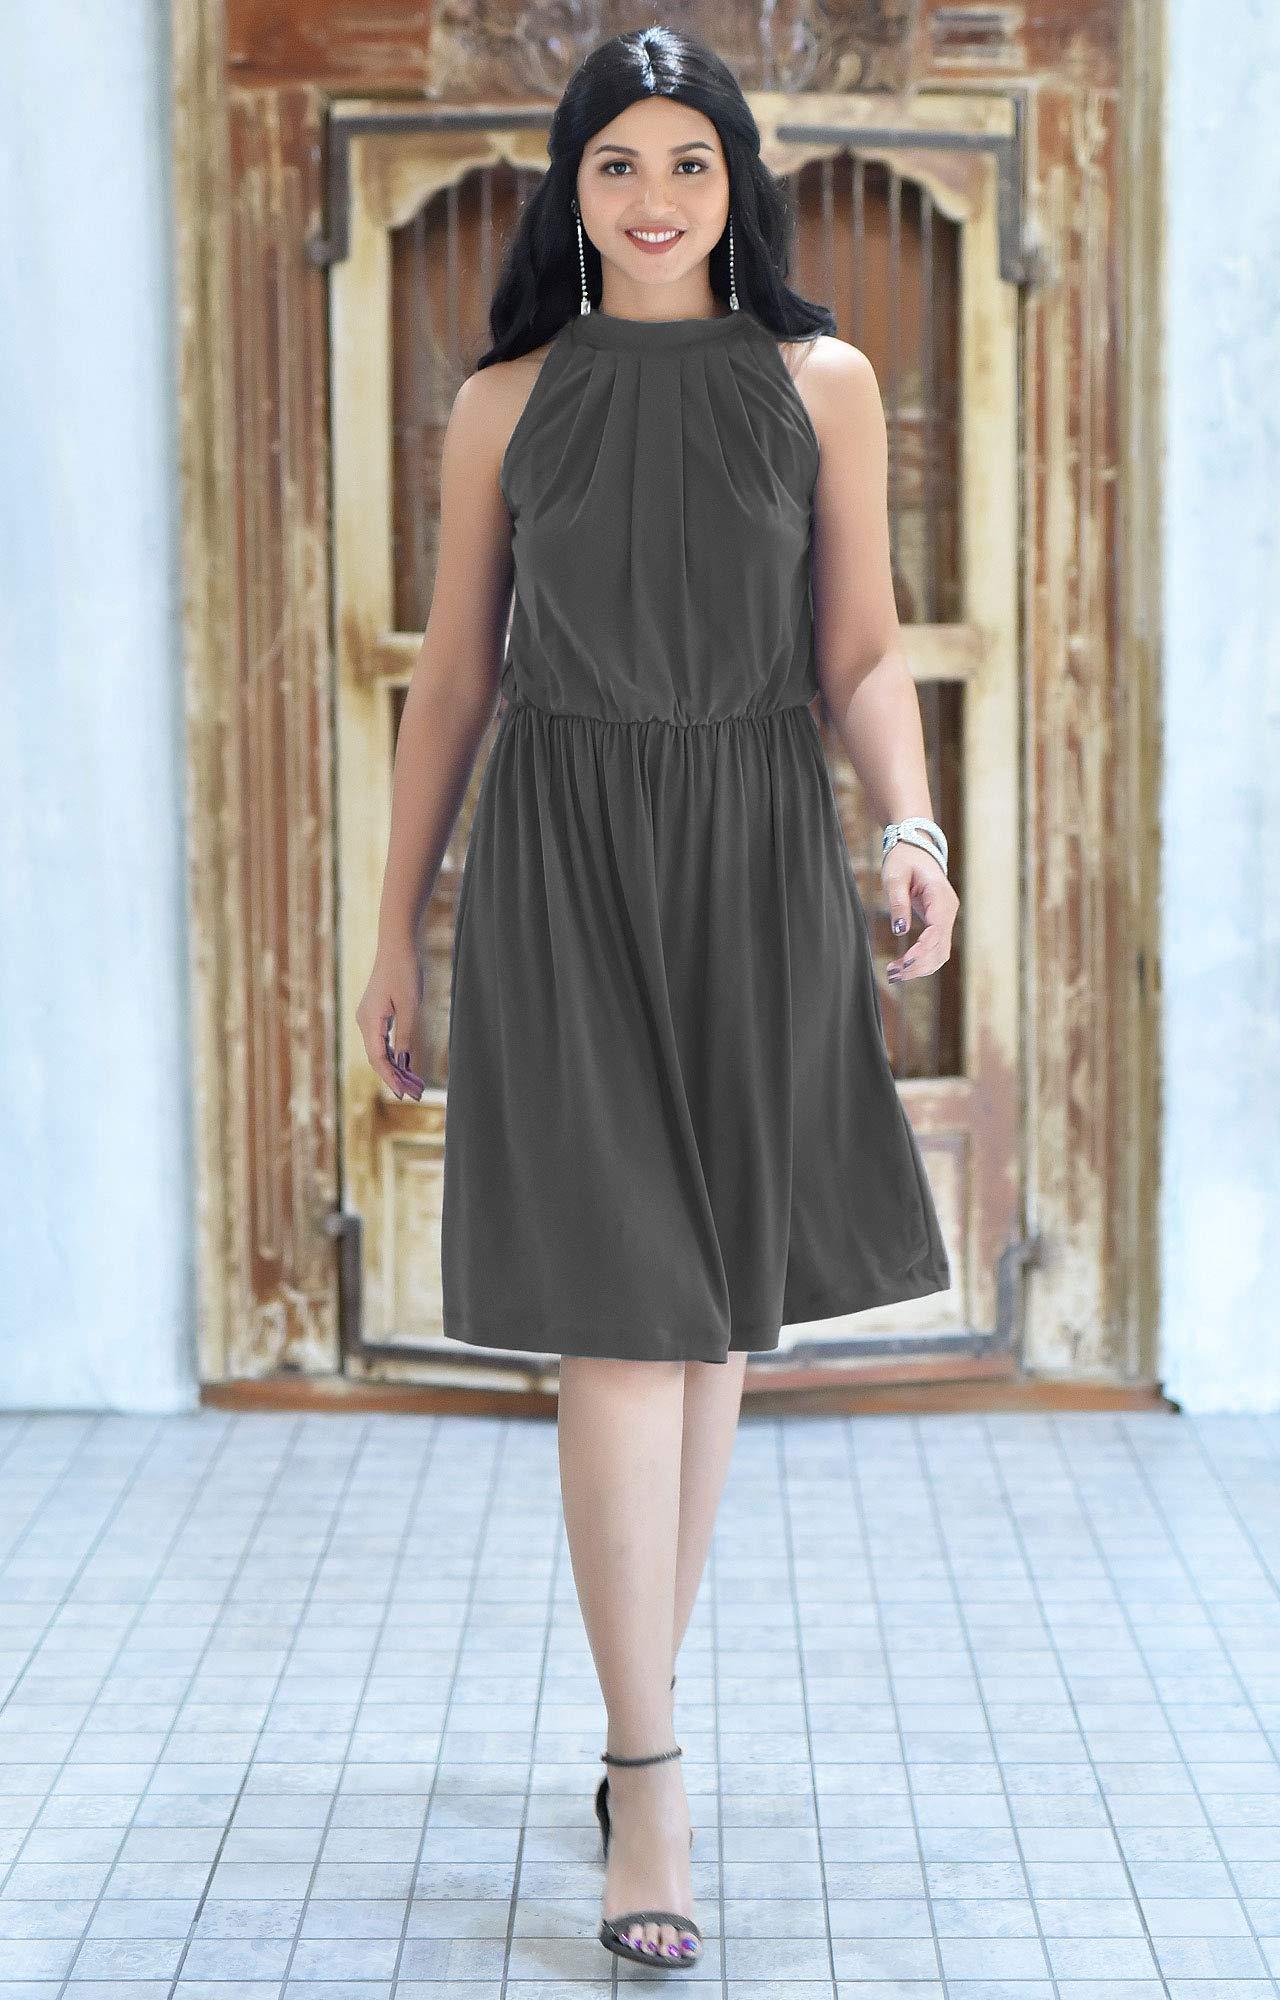 5284edc6b7e ... Formal Dressy Summer Casual Sexy Sundress Mini Midi Dress Dresses